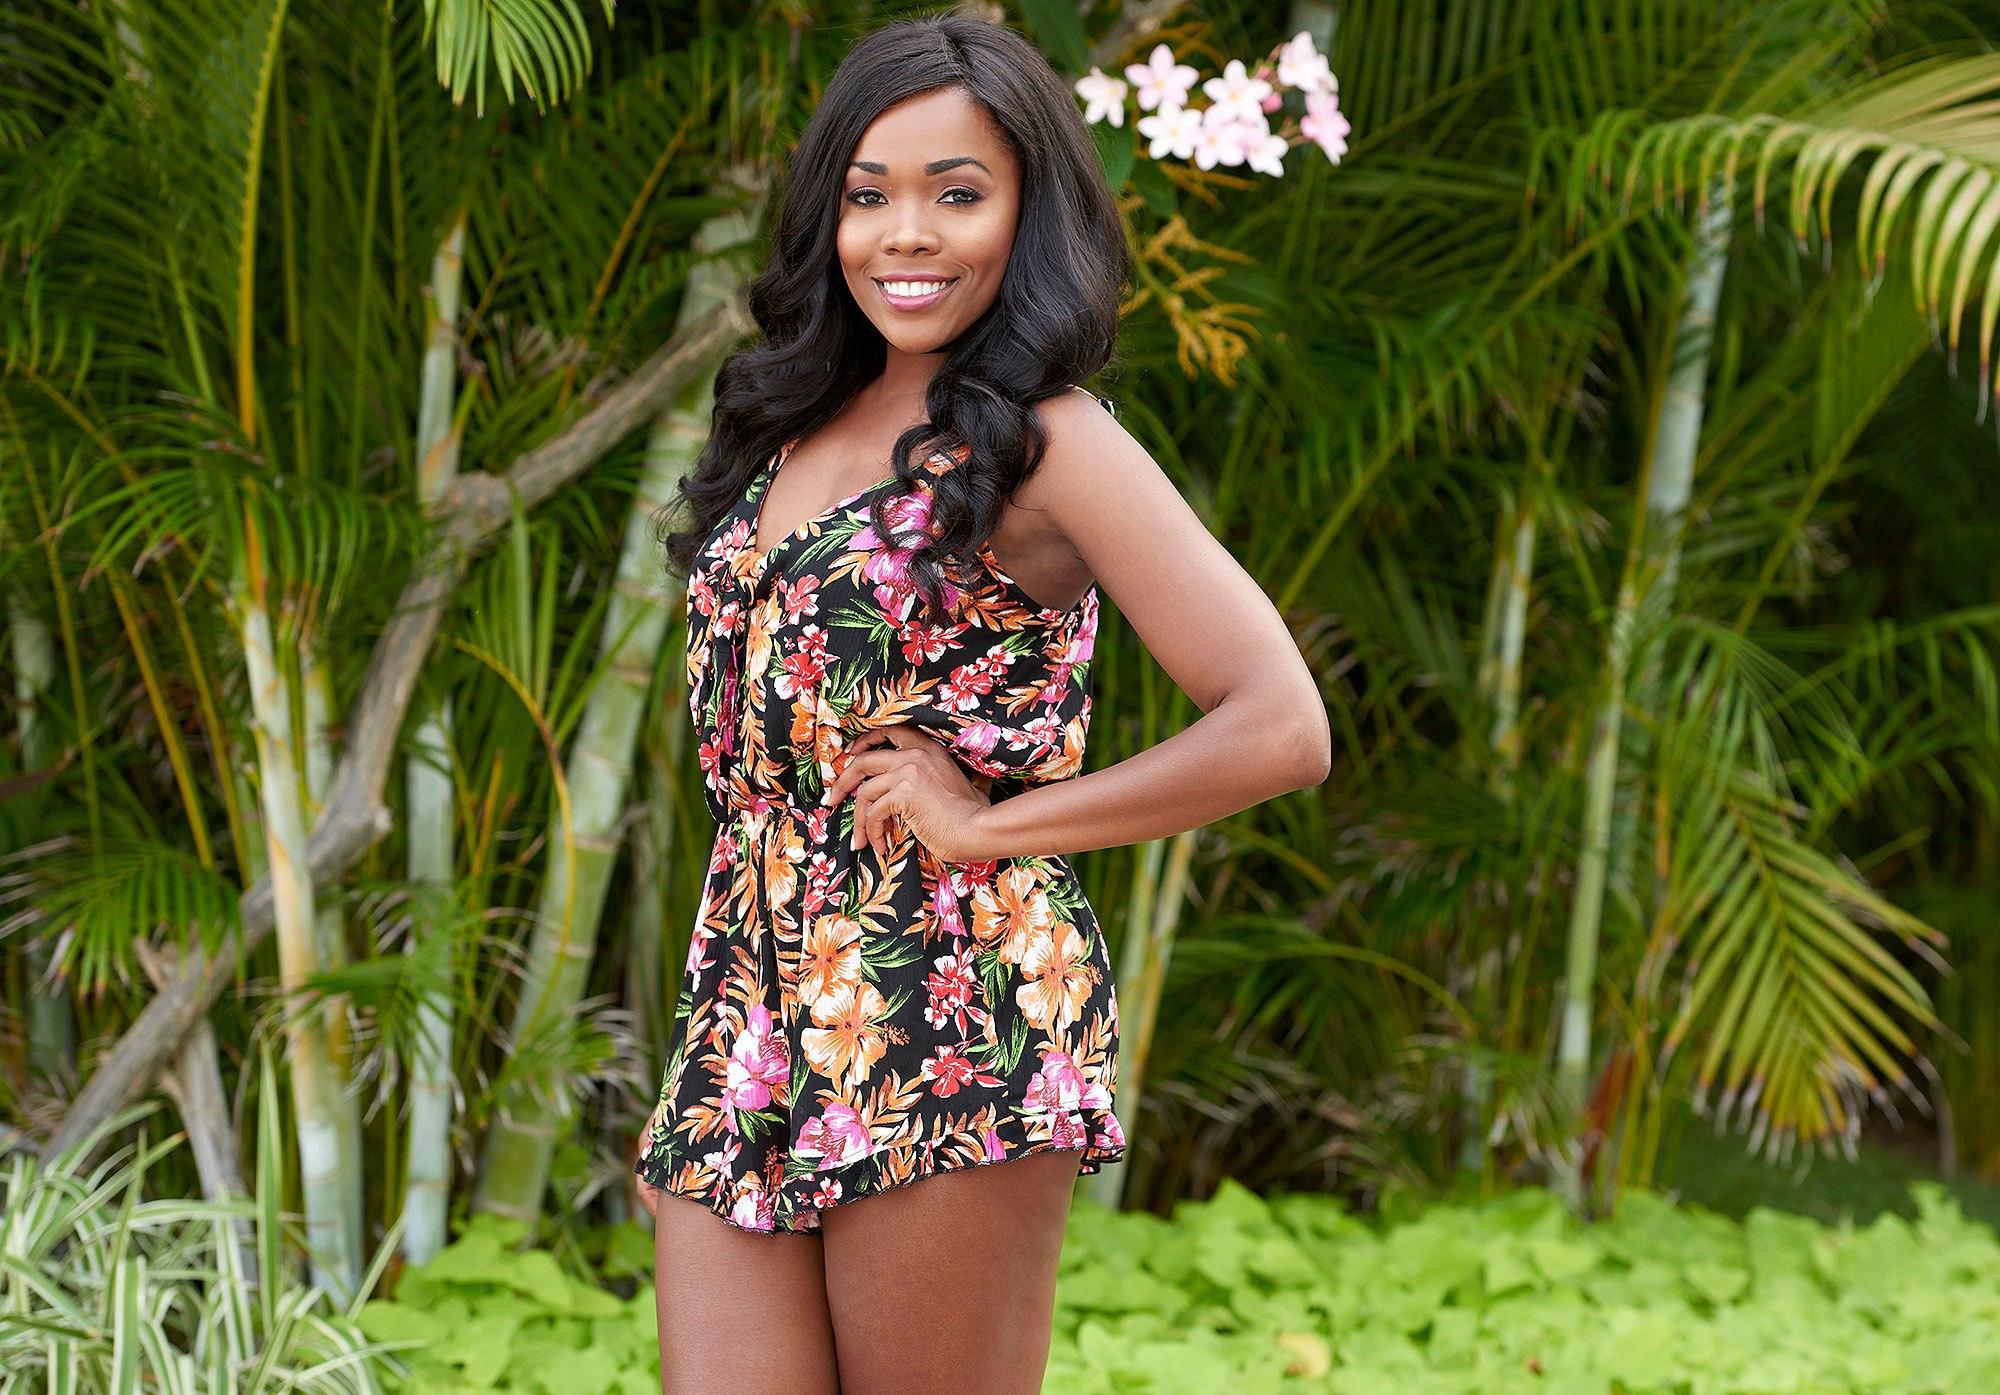 Jasmine Goode Bachelor in Paradise,Contestant,Wiki,Bio,Age,Profile,Images,Boyfriend | Full Details